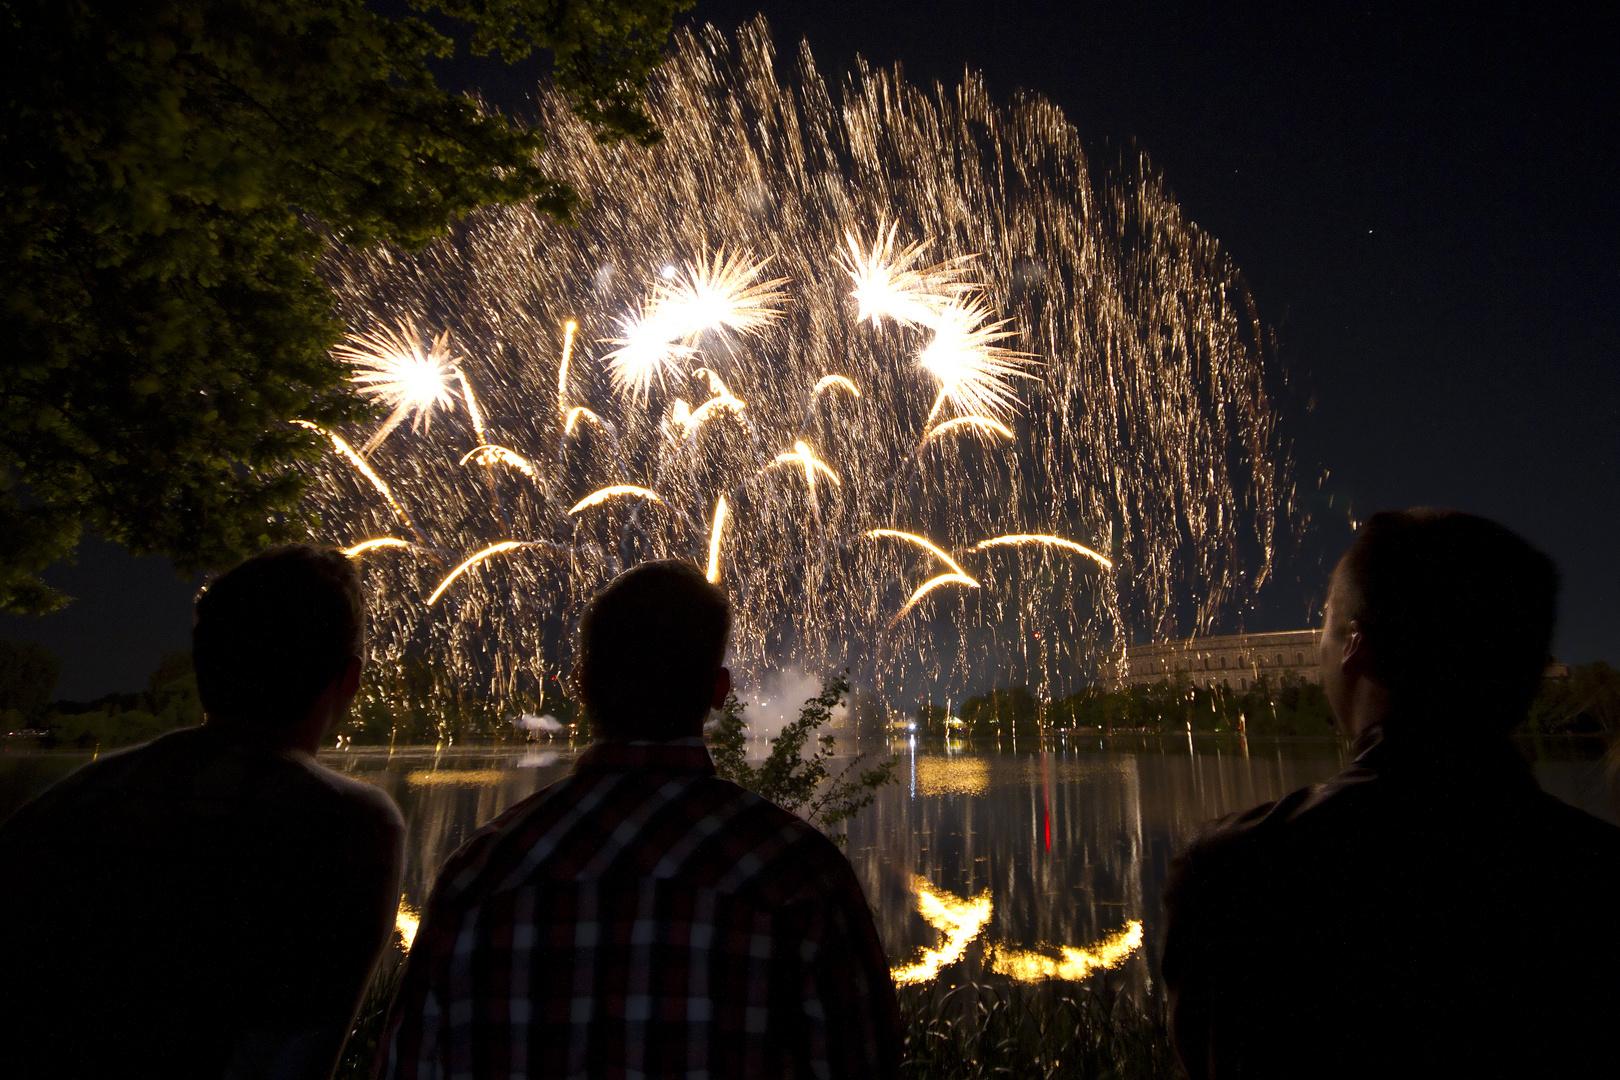 Abschlussfeuerwerk Frühlingsfest Nürnberg